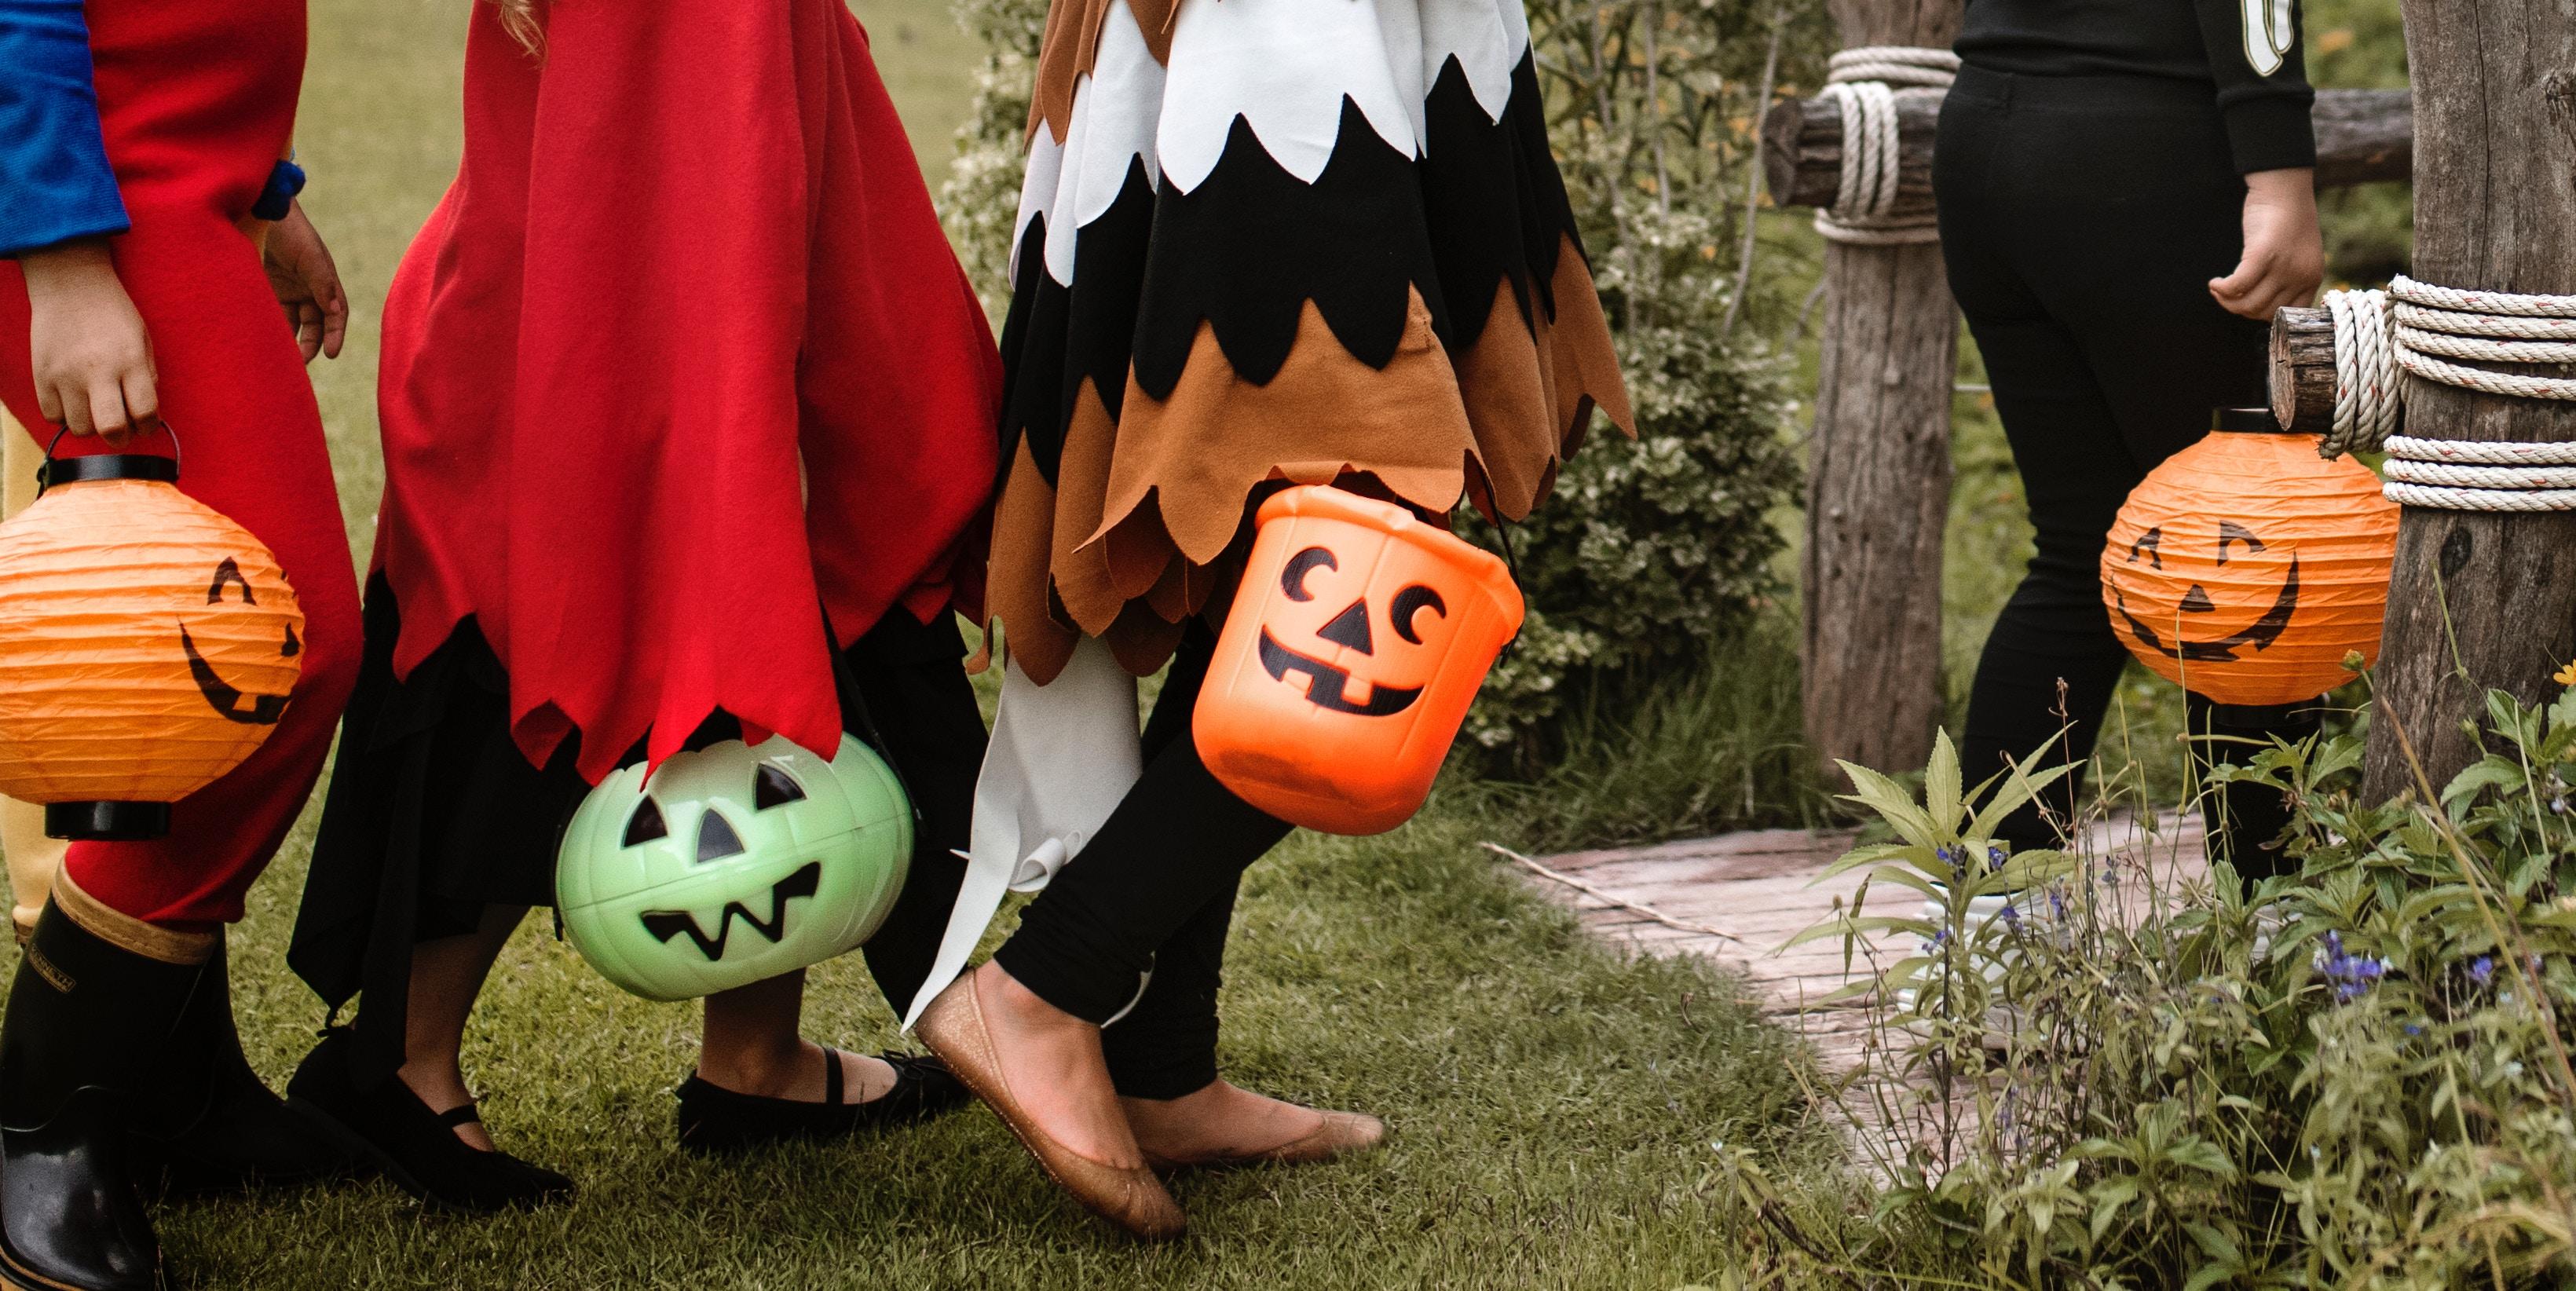 12 Fun Halloween Party Games